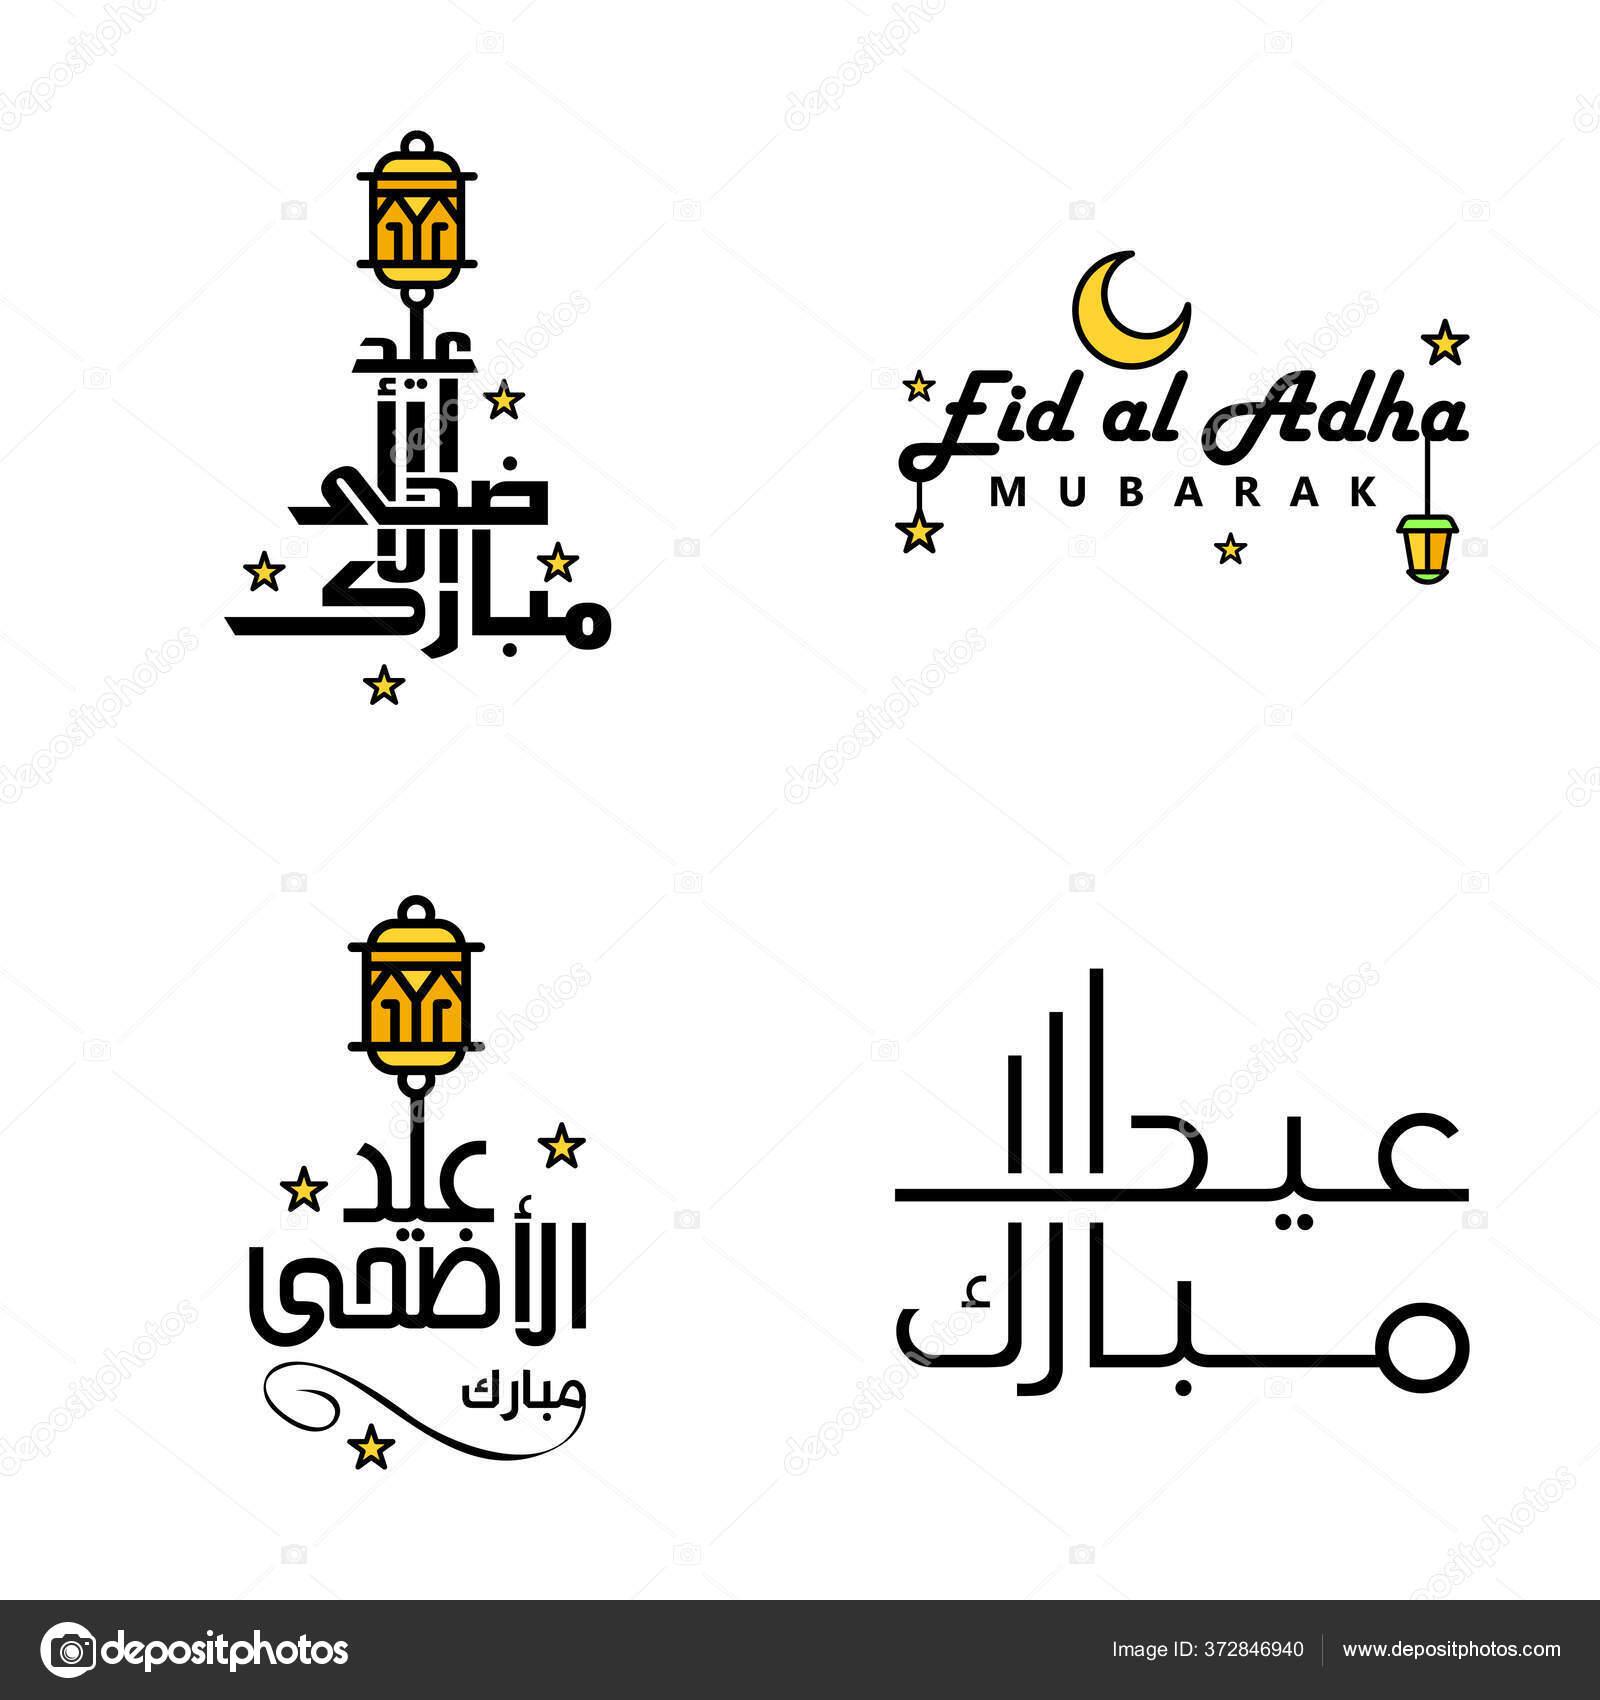 Happy Eid Mubarak Selamat Hari Raya Idul Fitri Eid Fitr Vector Image By C Flatart Vector Stock 372846940